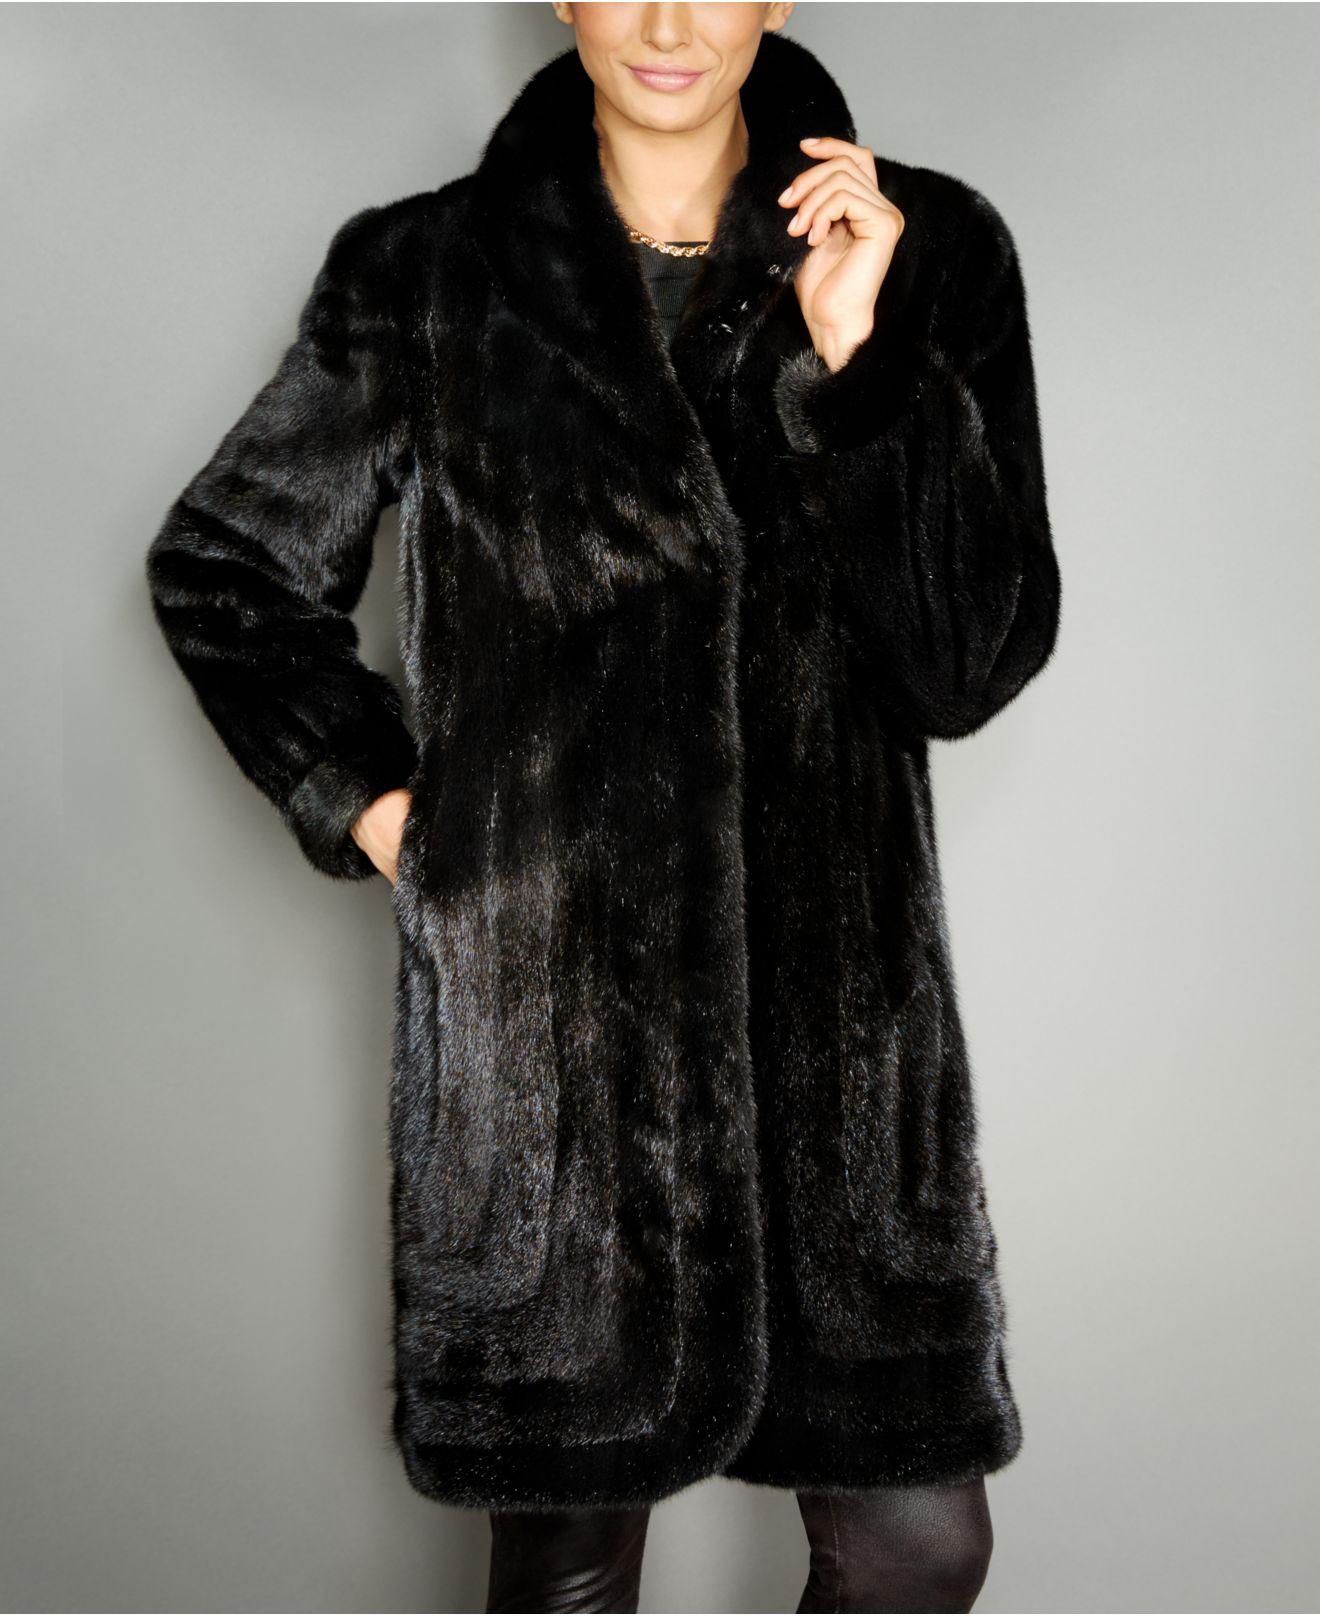 565e2521776 Lyst - The Fur Vault Mink Fur Coat in Black